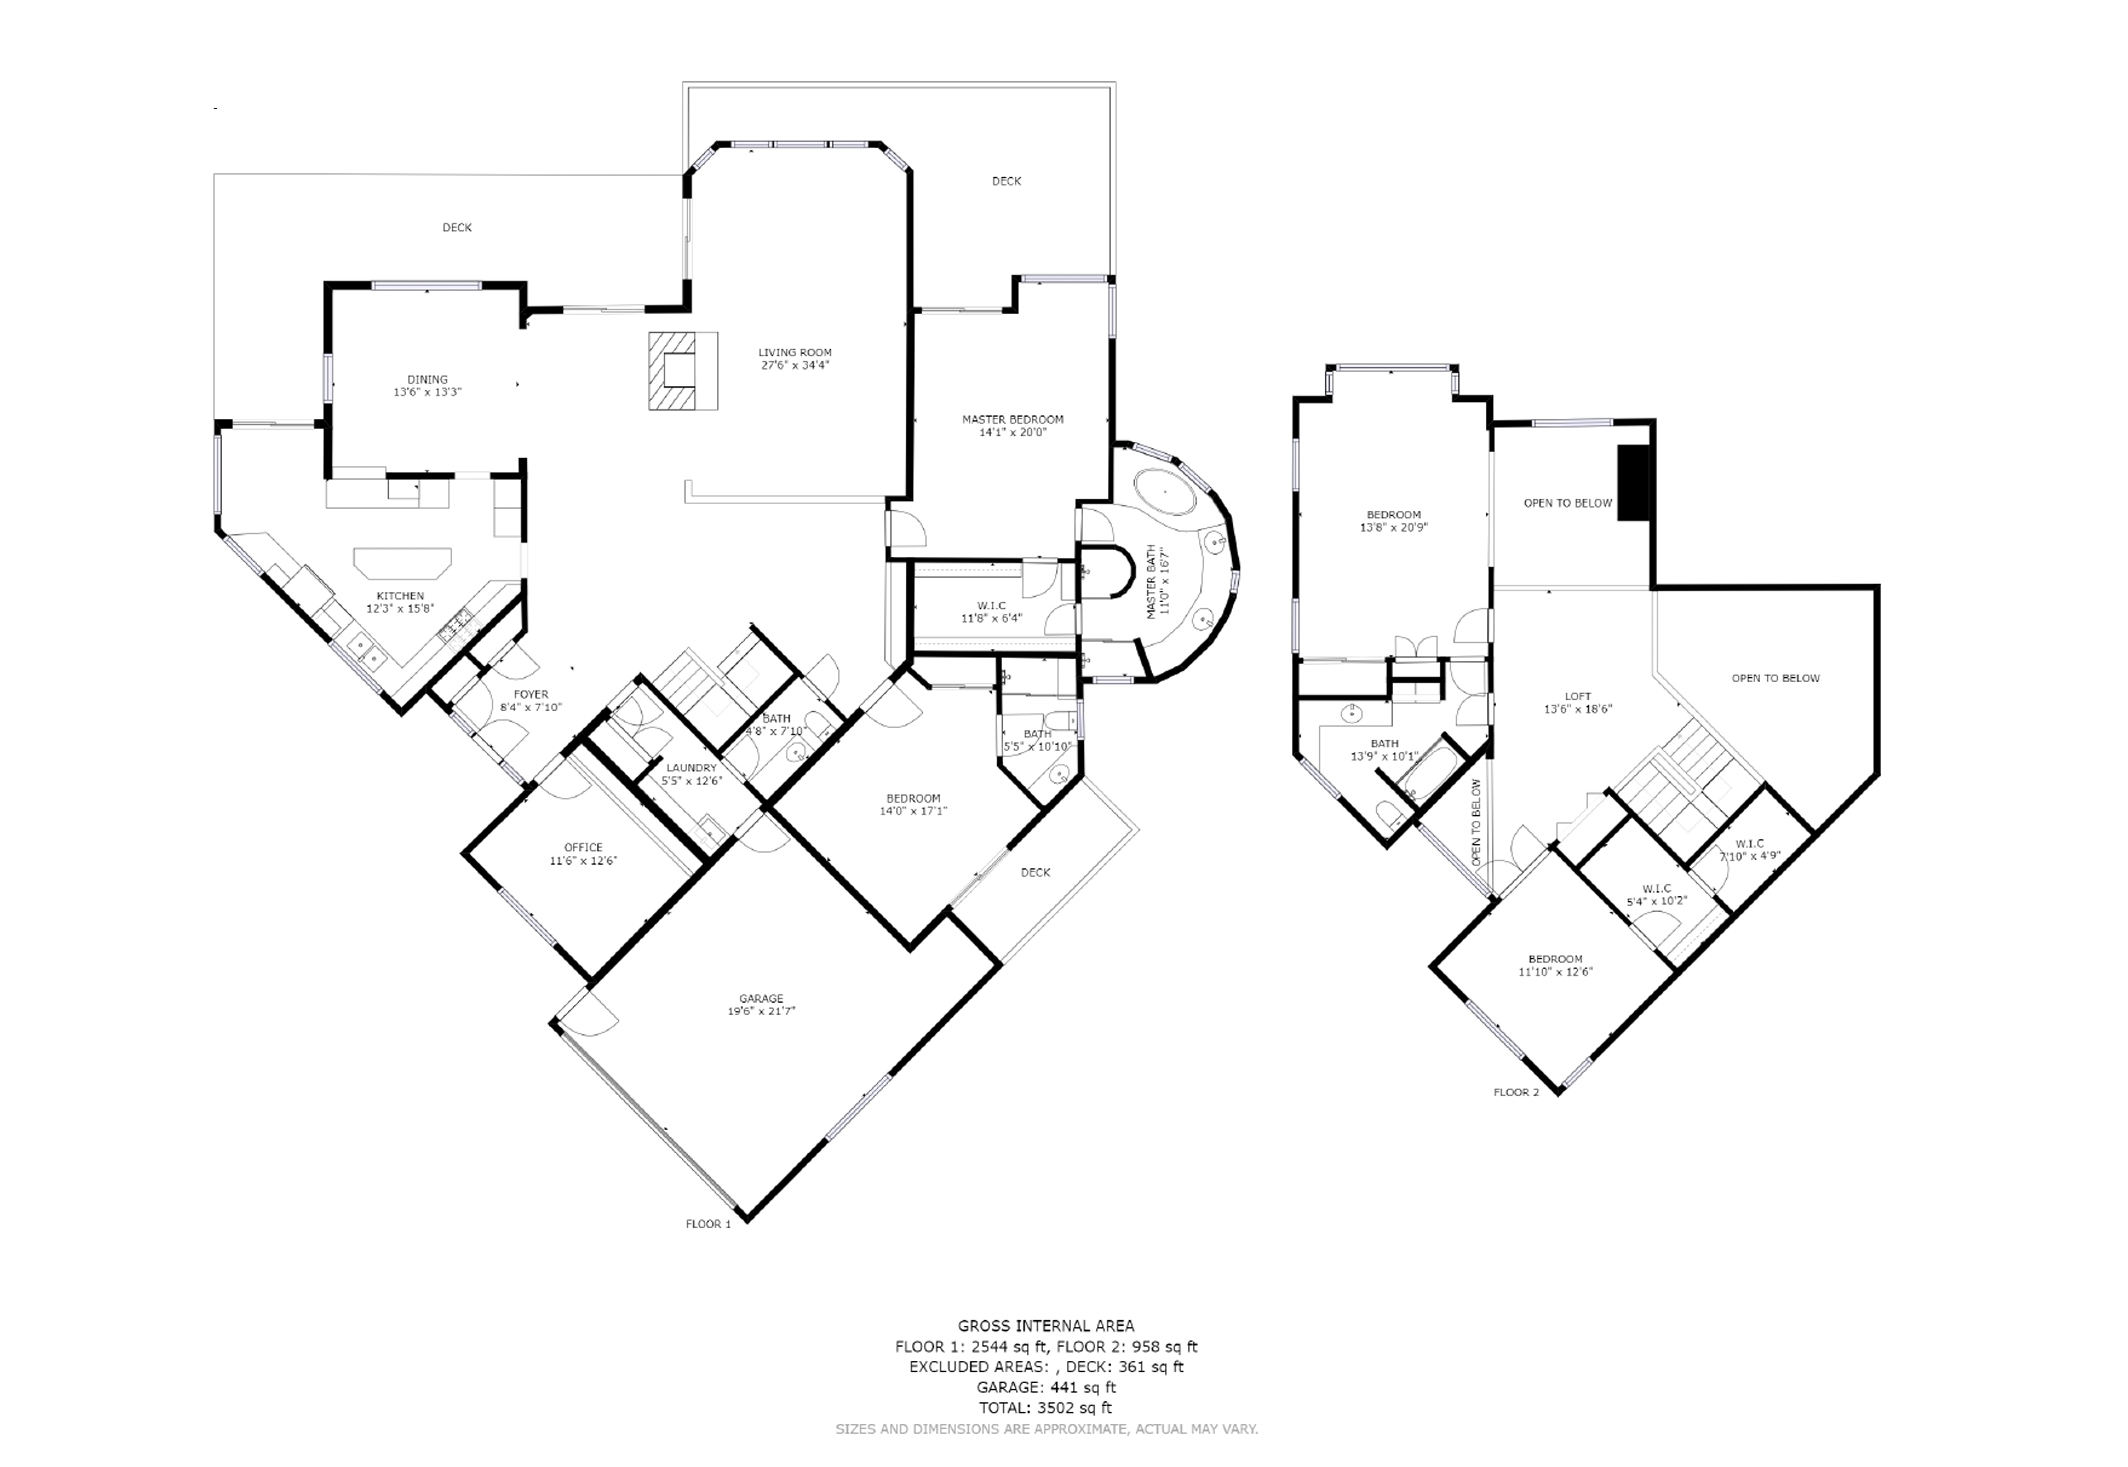 JOHNS PLACE floor plans.jpg